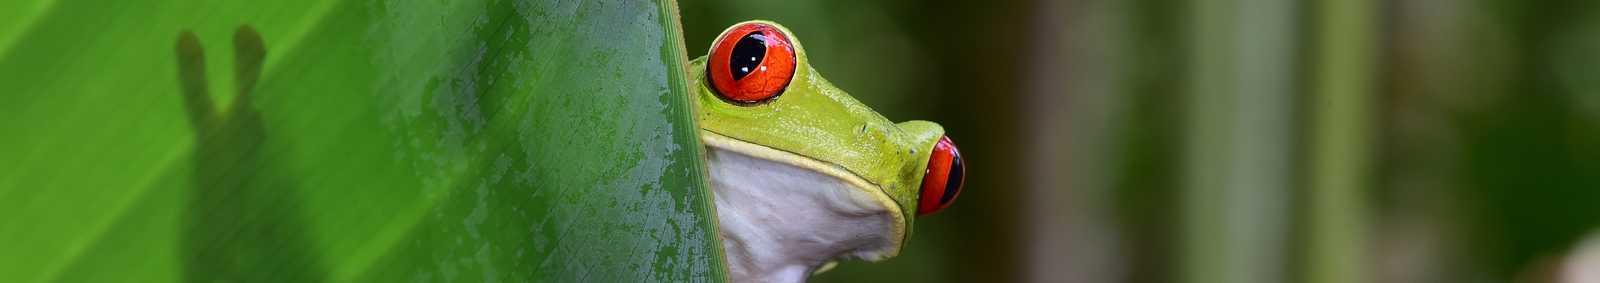 Frog Costa Rica